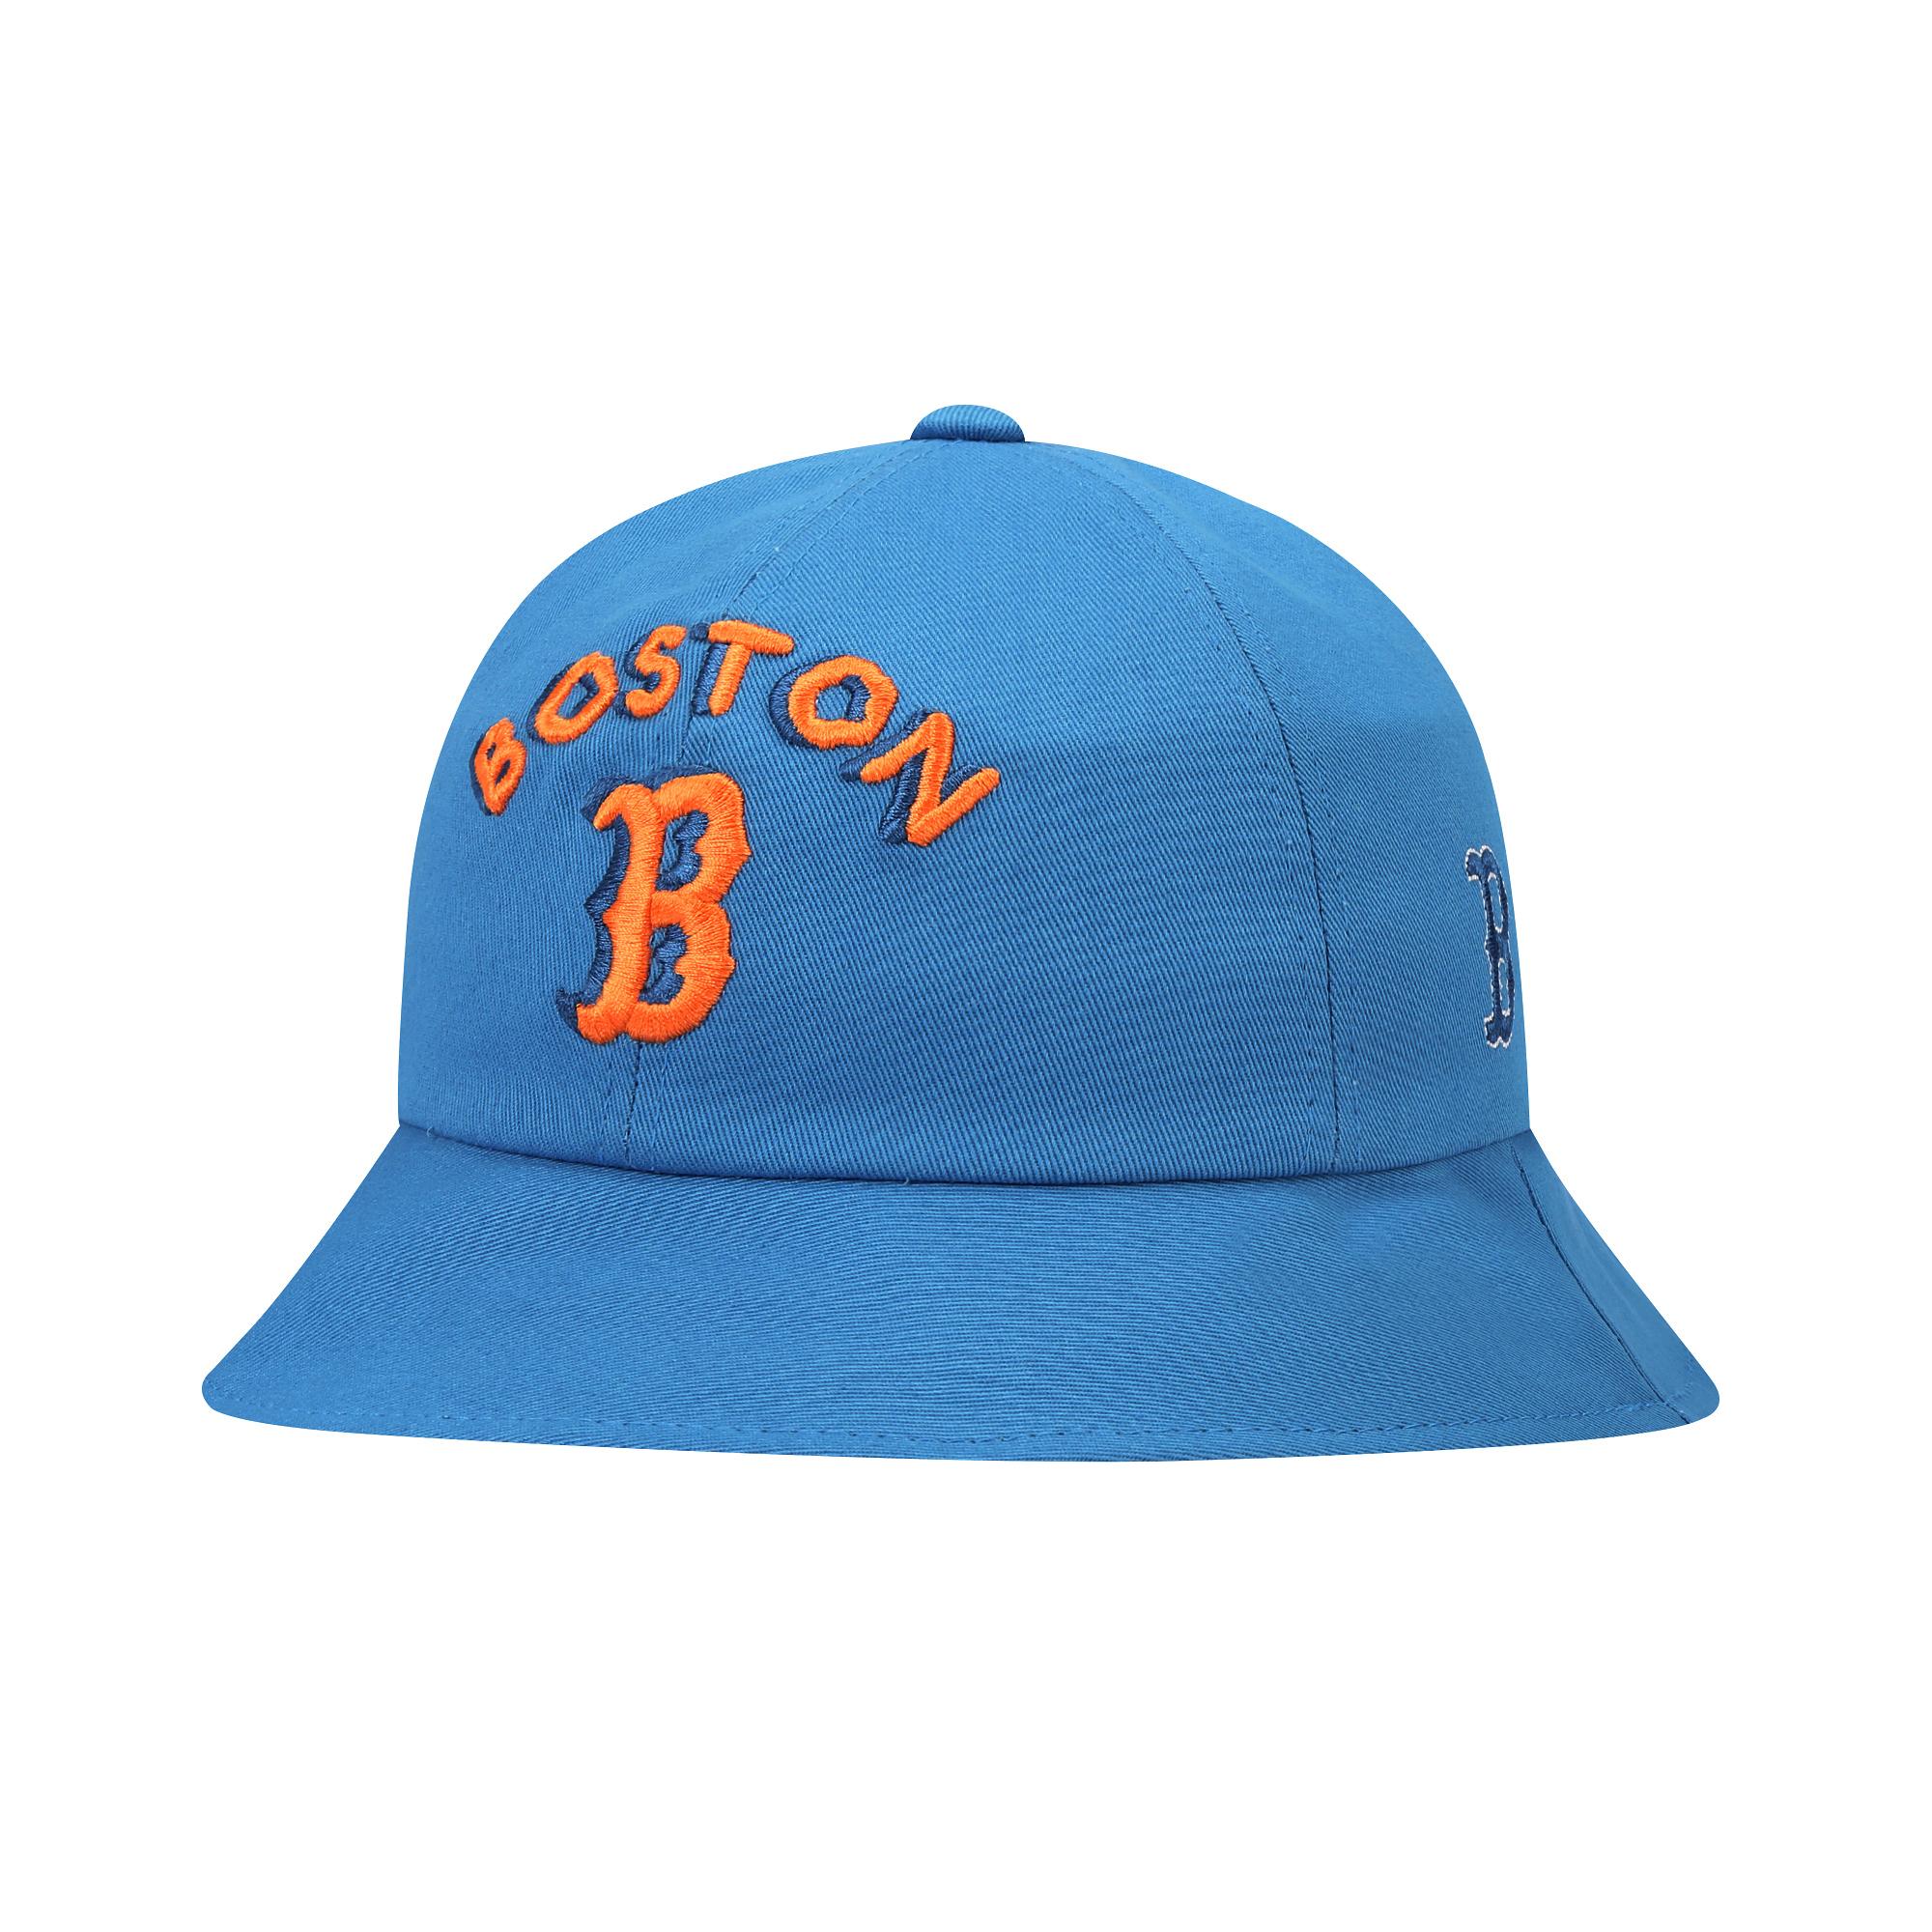 MLB LIKE  햇 보스턴레드삭스